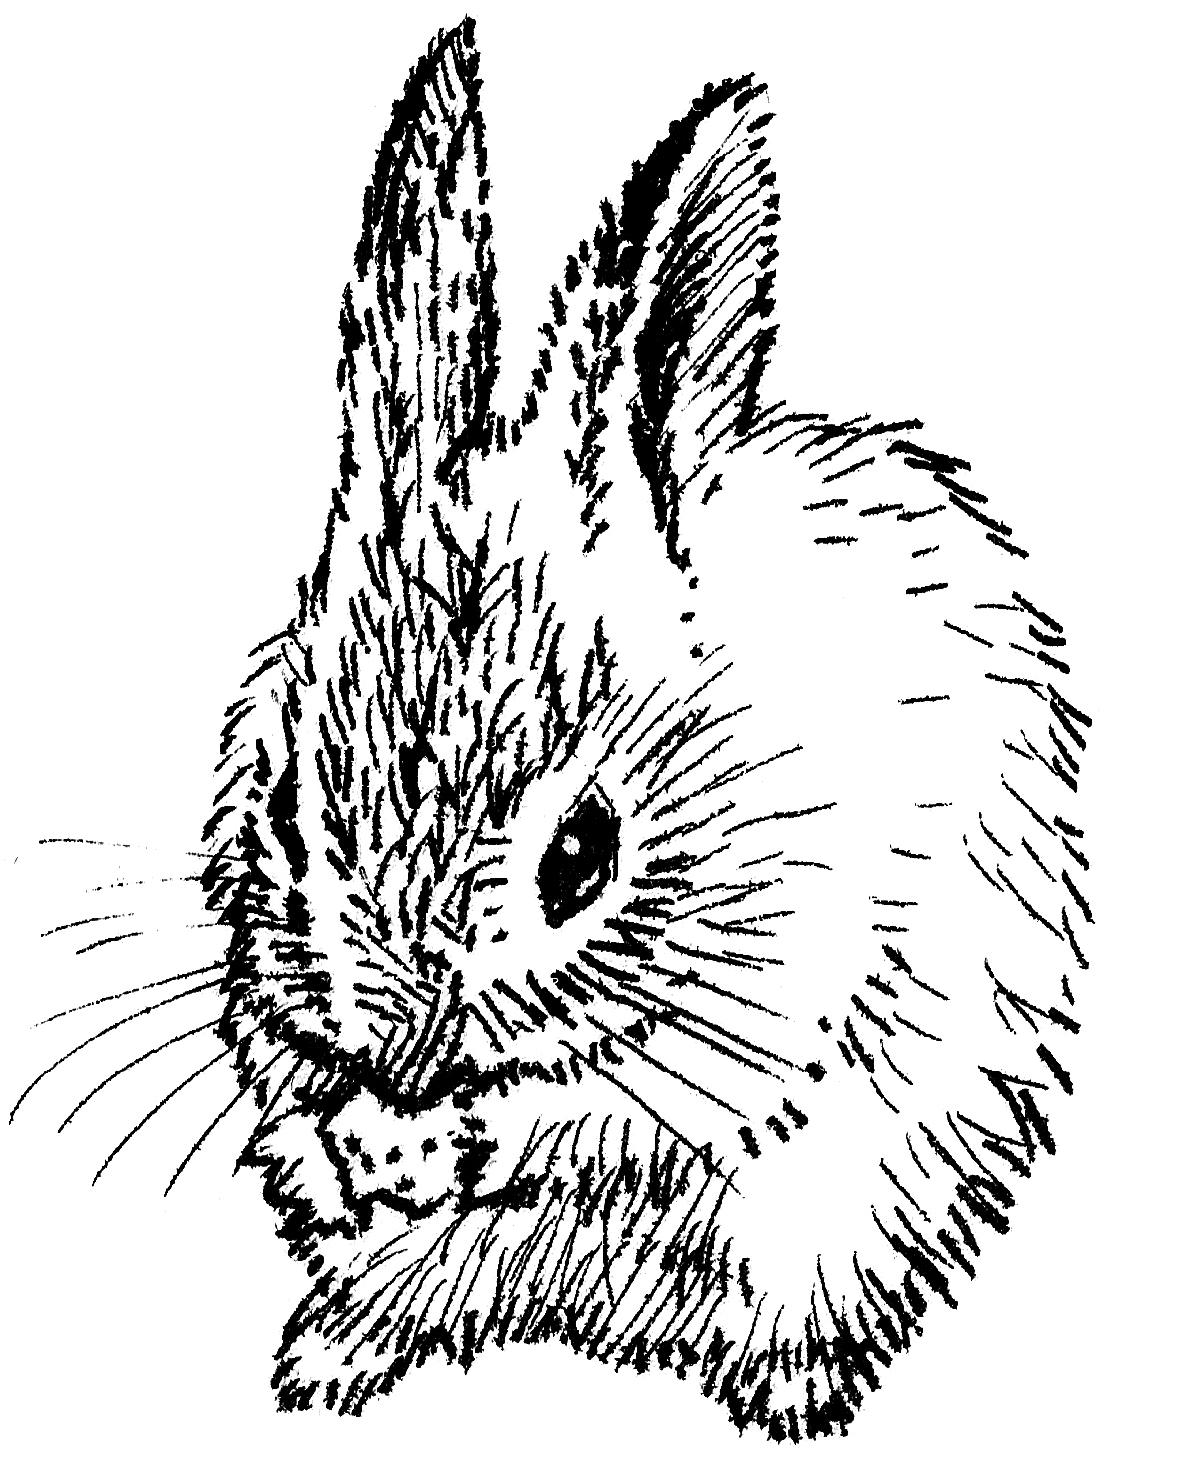 '4oz Rabbit'